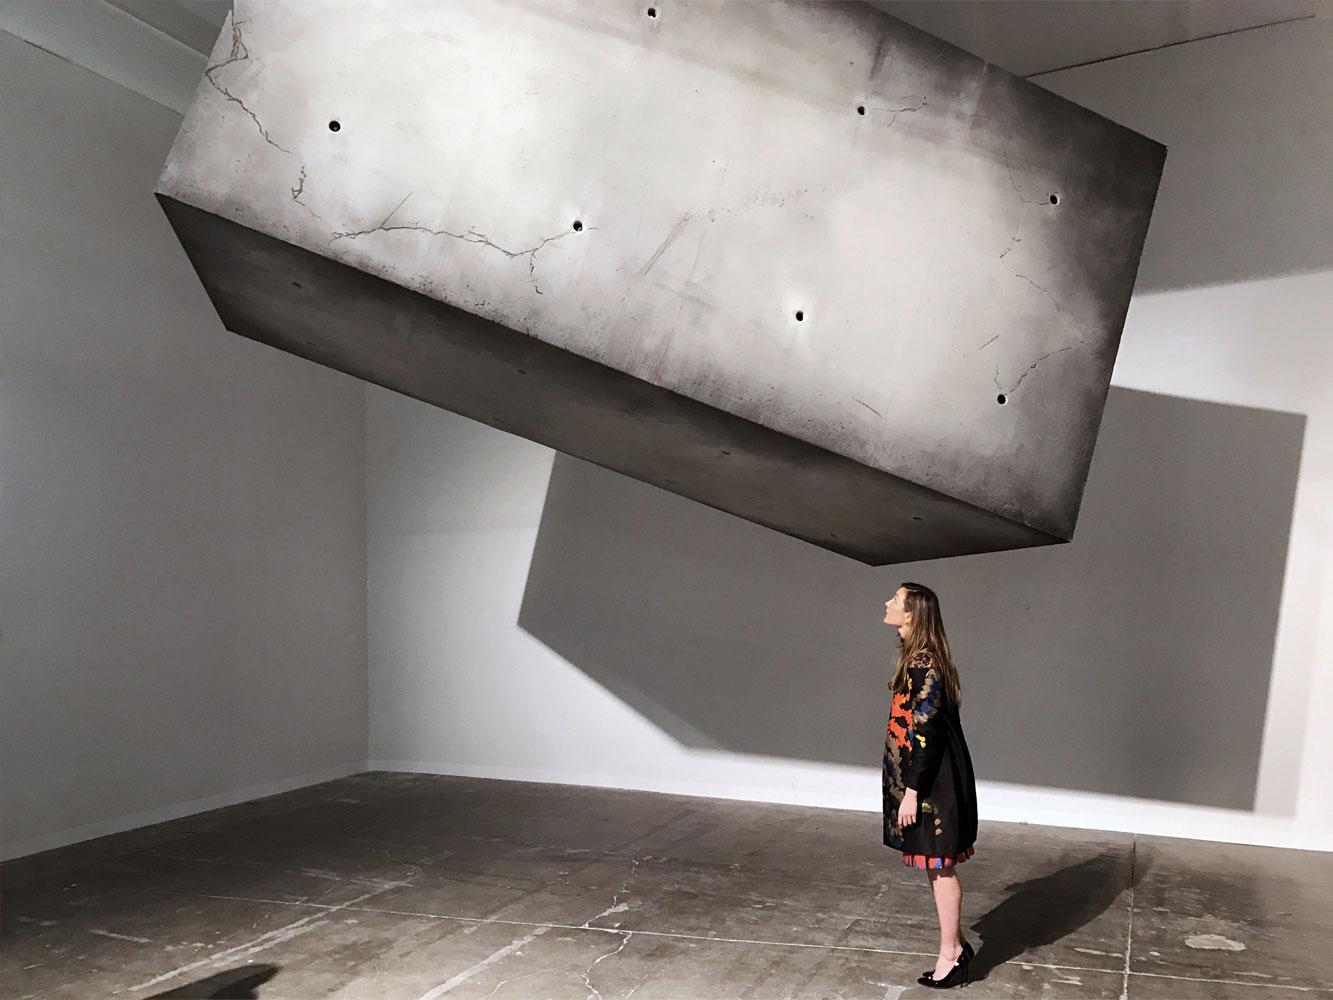 A huge floating monolith has appeared in Helsinki's Amos Rex museum